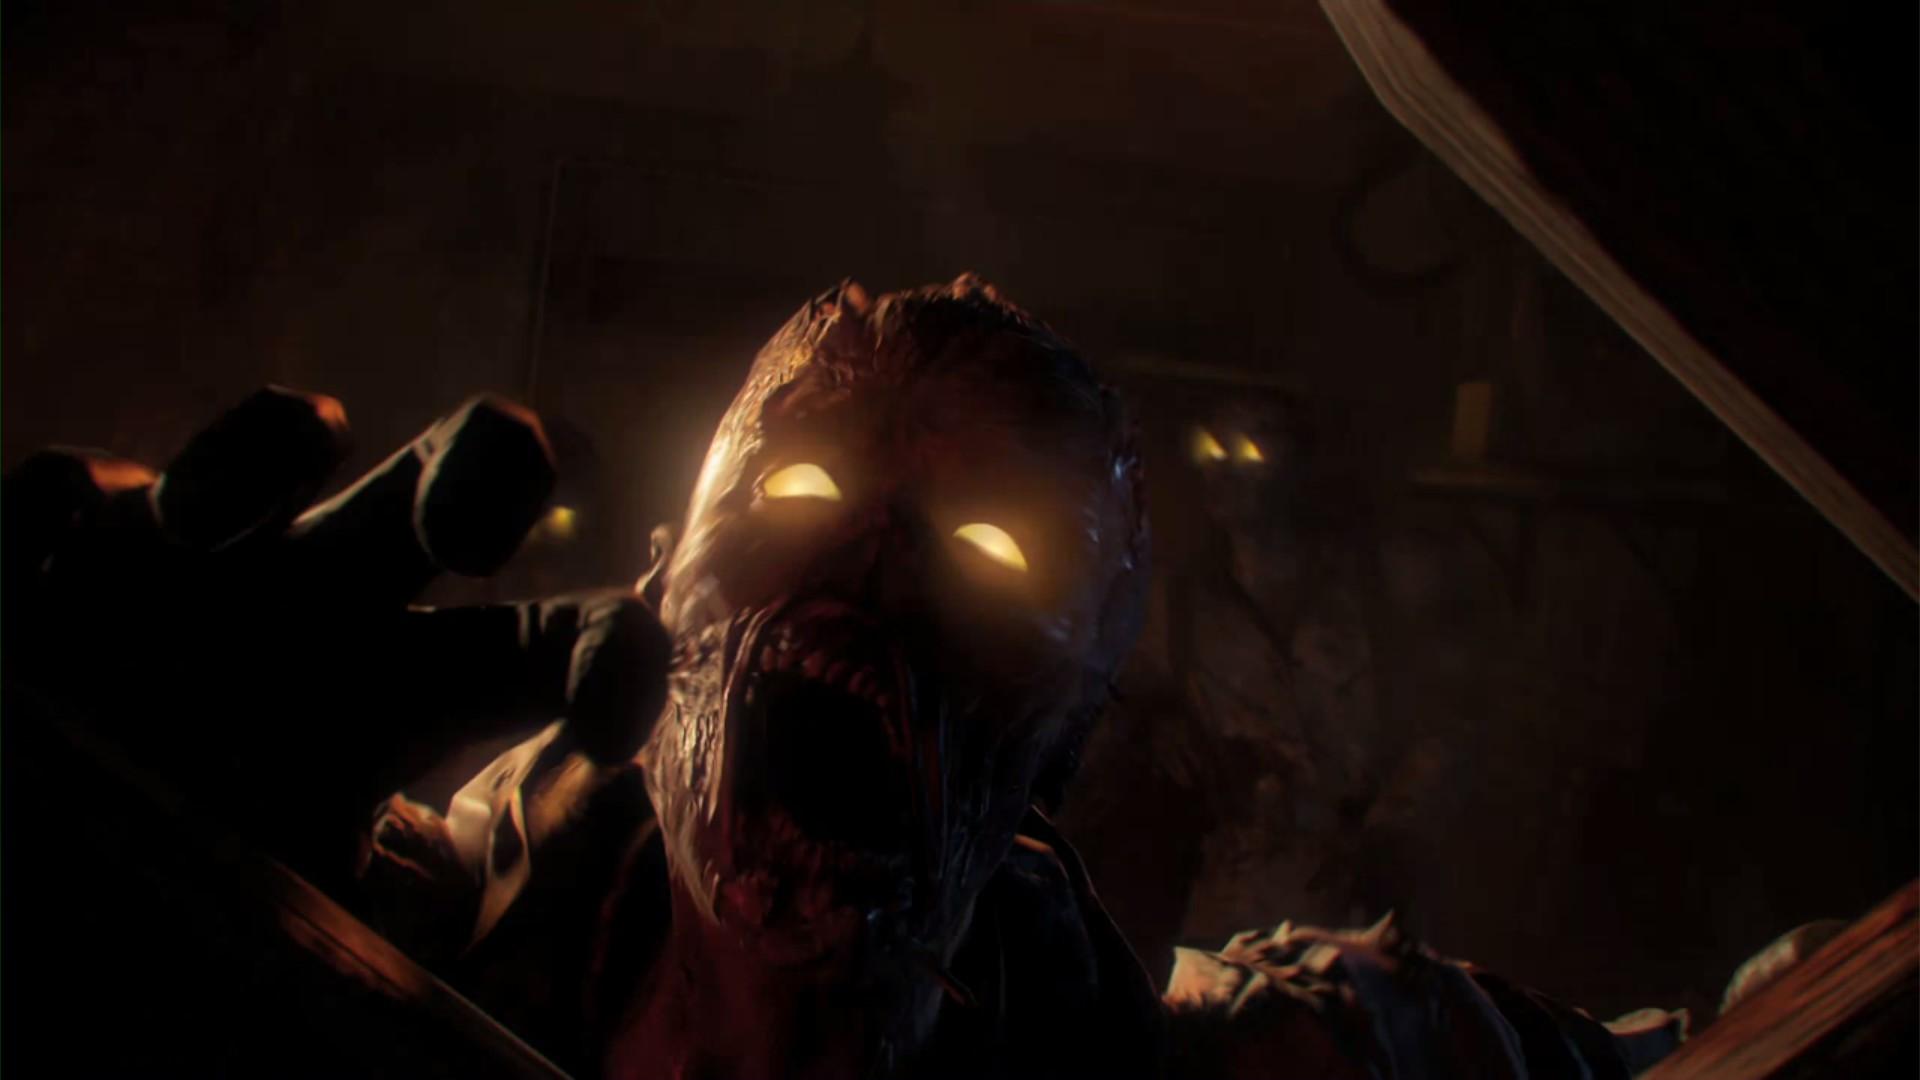 Call Of Duty Black Ops 3 Zombie Wiki Vinnyoleo Vegetalinfo